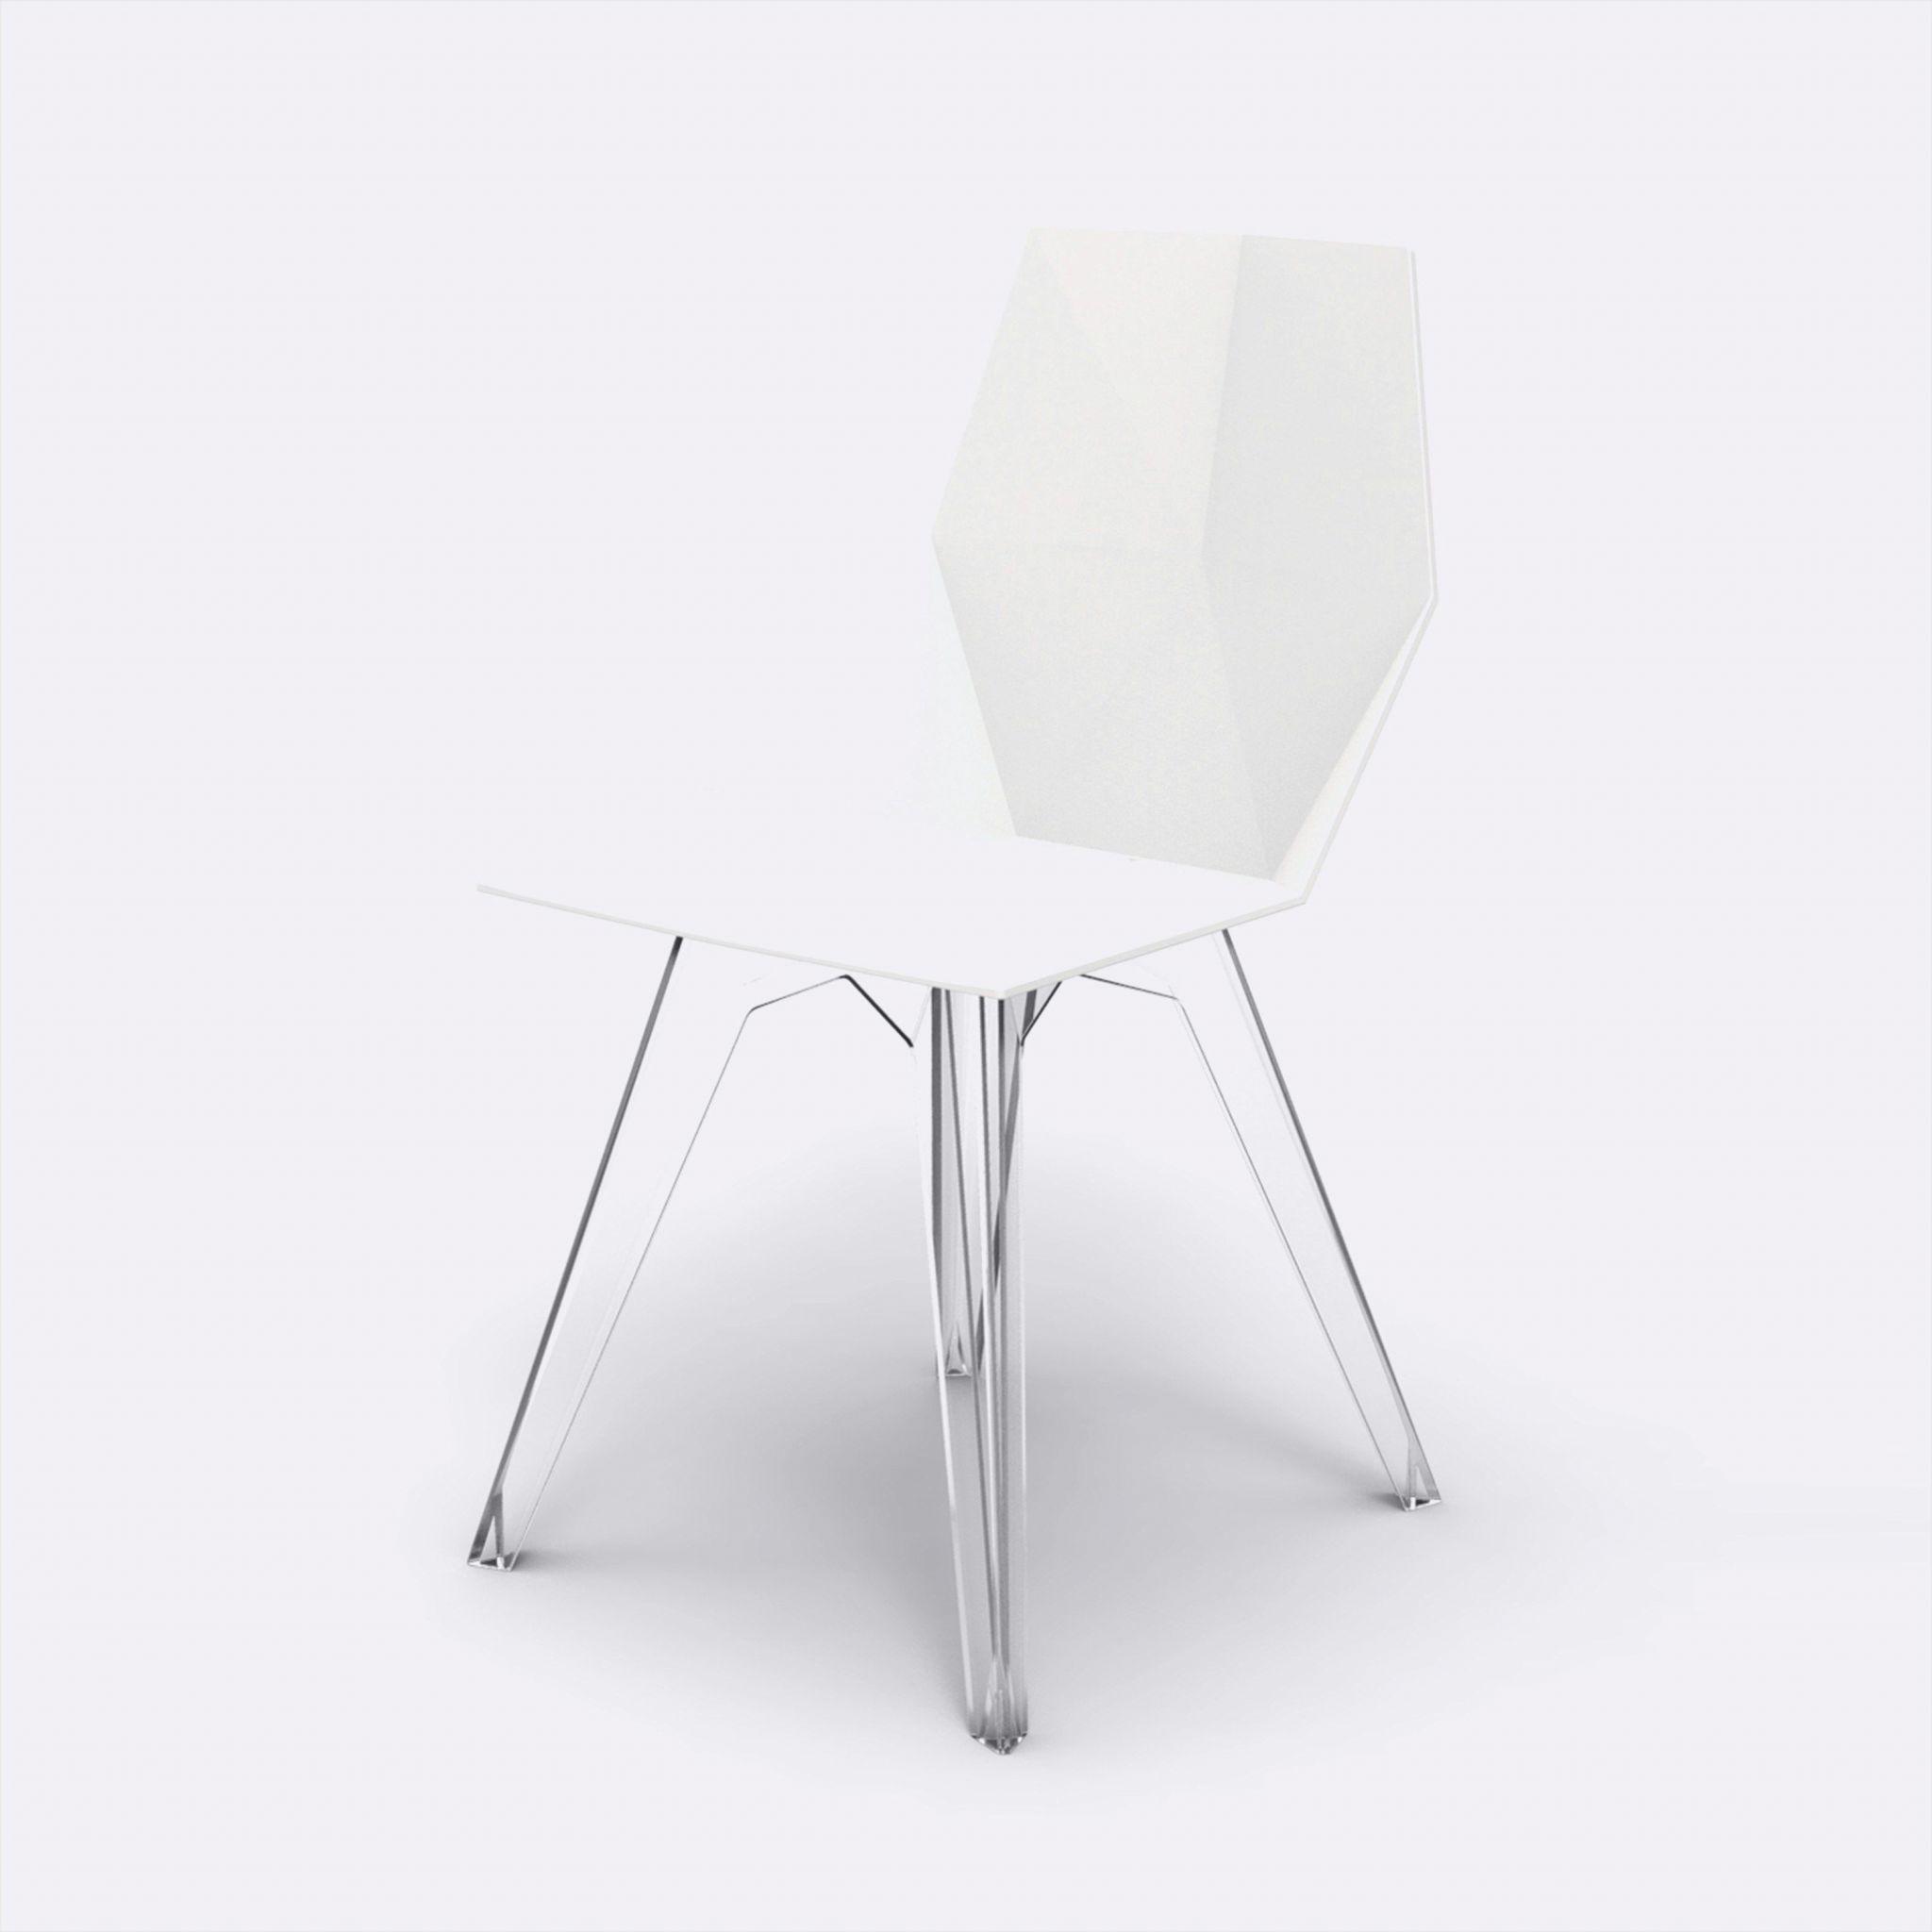 table de jardin aluminium blanc ainsi que chaise bois cuisine chaise bois metal chaise roulette 0d coleymixan de table de jardin aluminium blanc